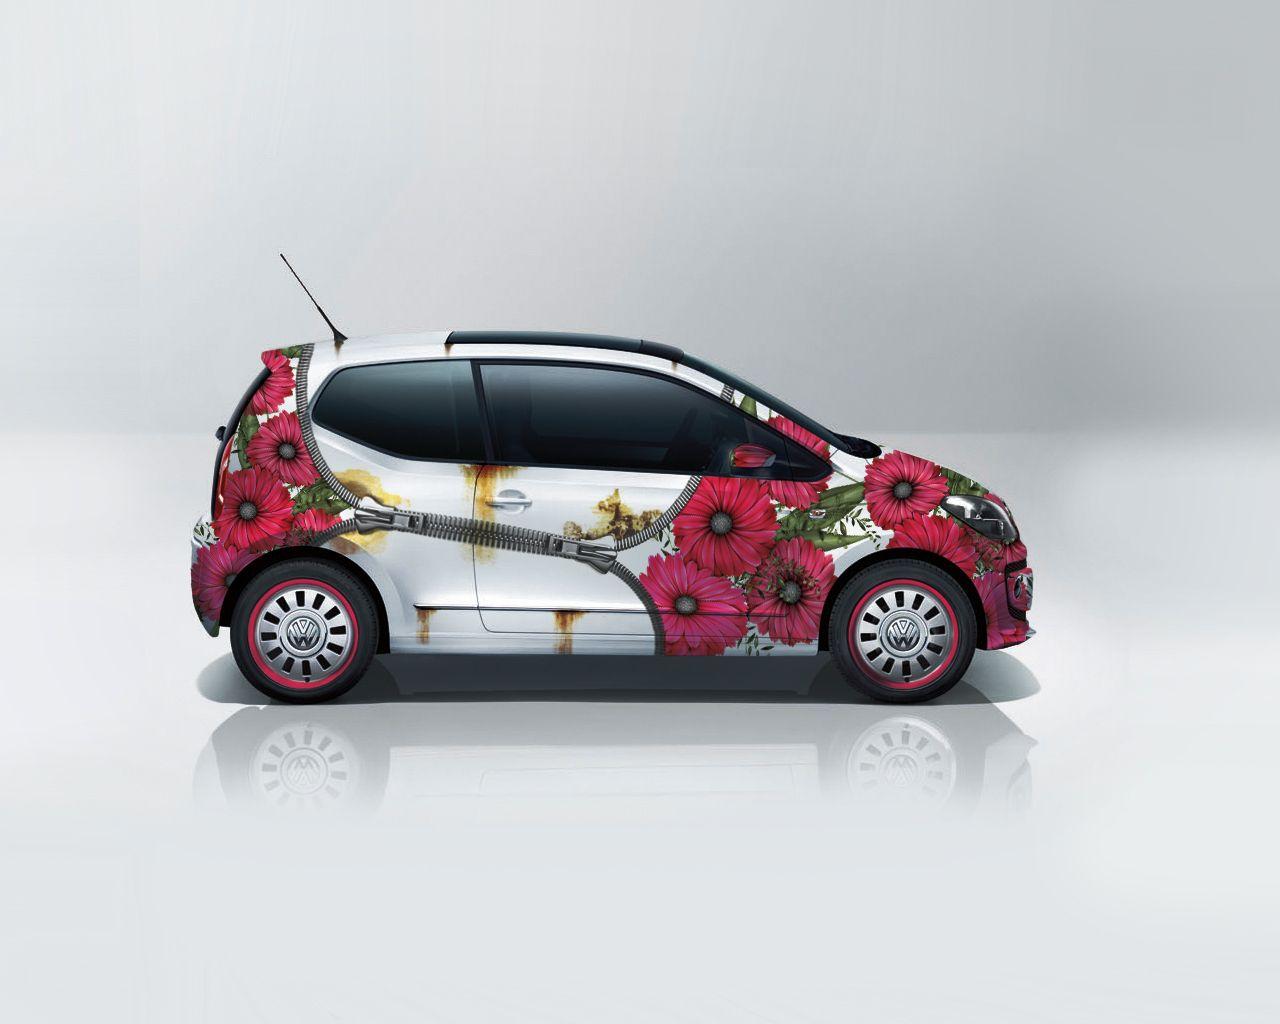 car wrap design for avis car rent comapny in lithuania. Black Bedroom Furniture Sets. Home Design Ideas